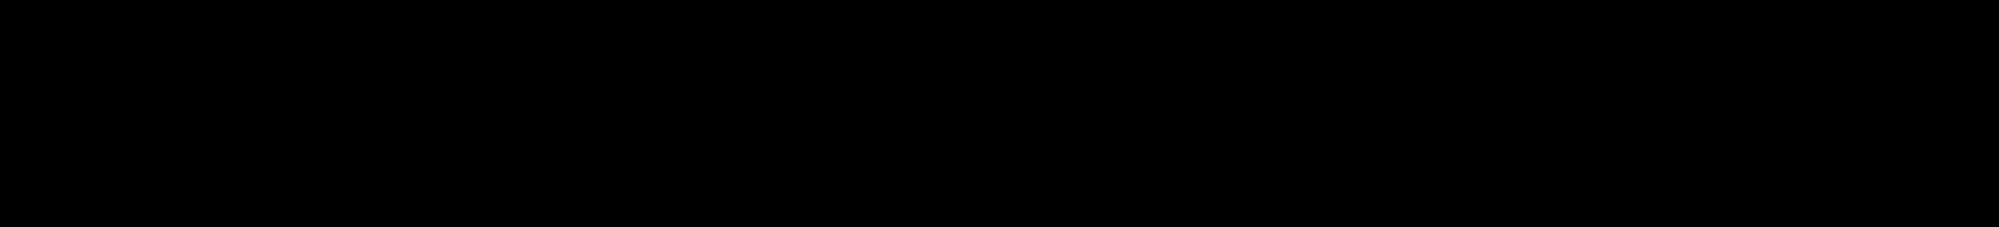 image147.png